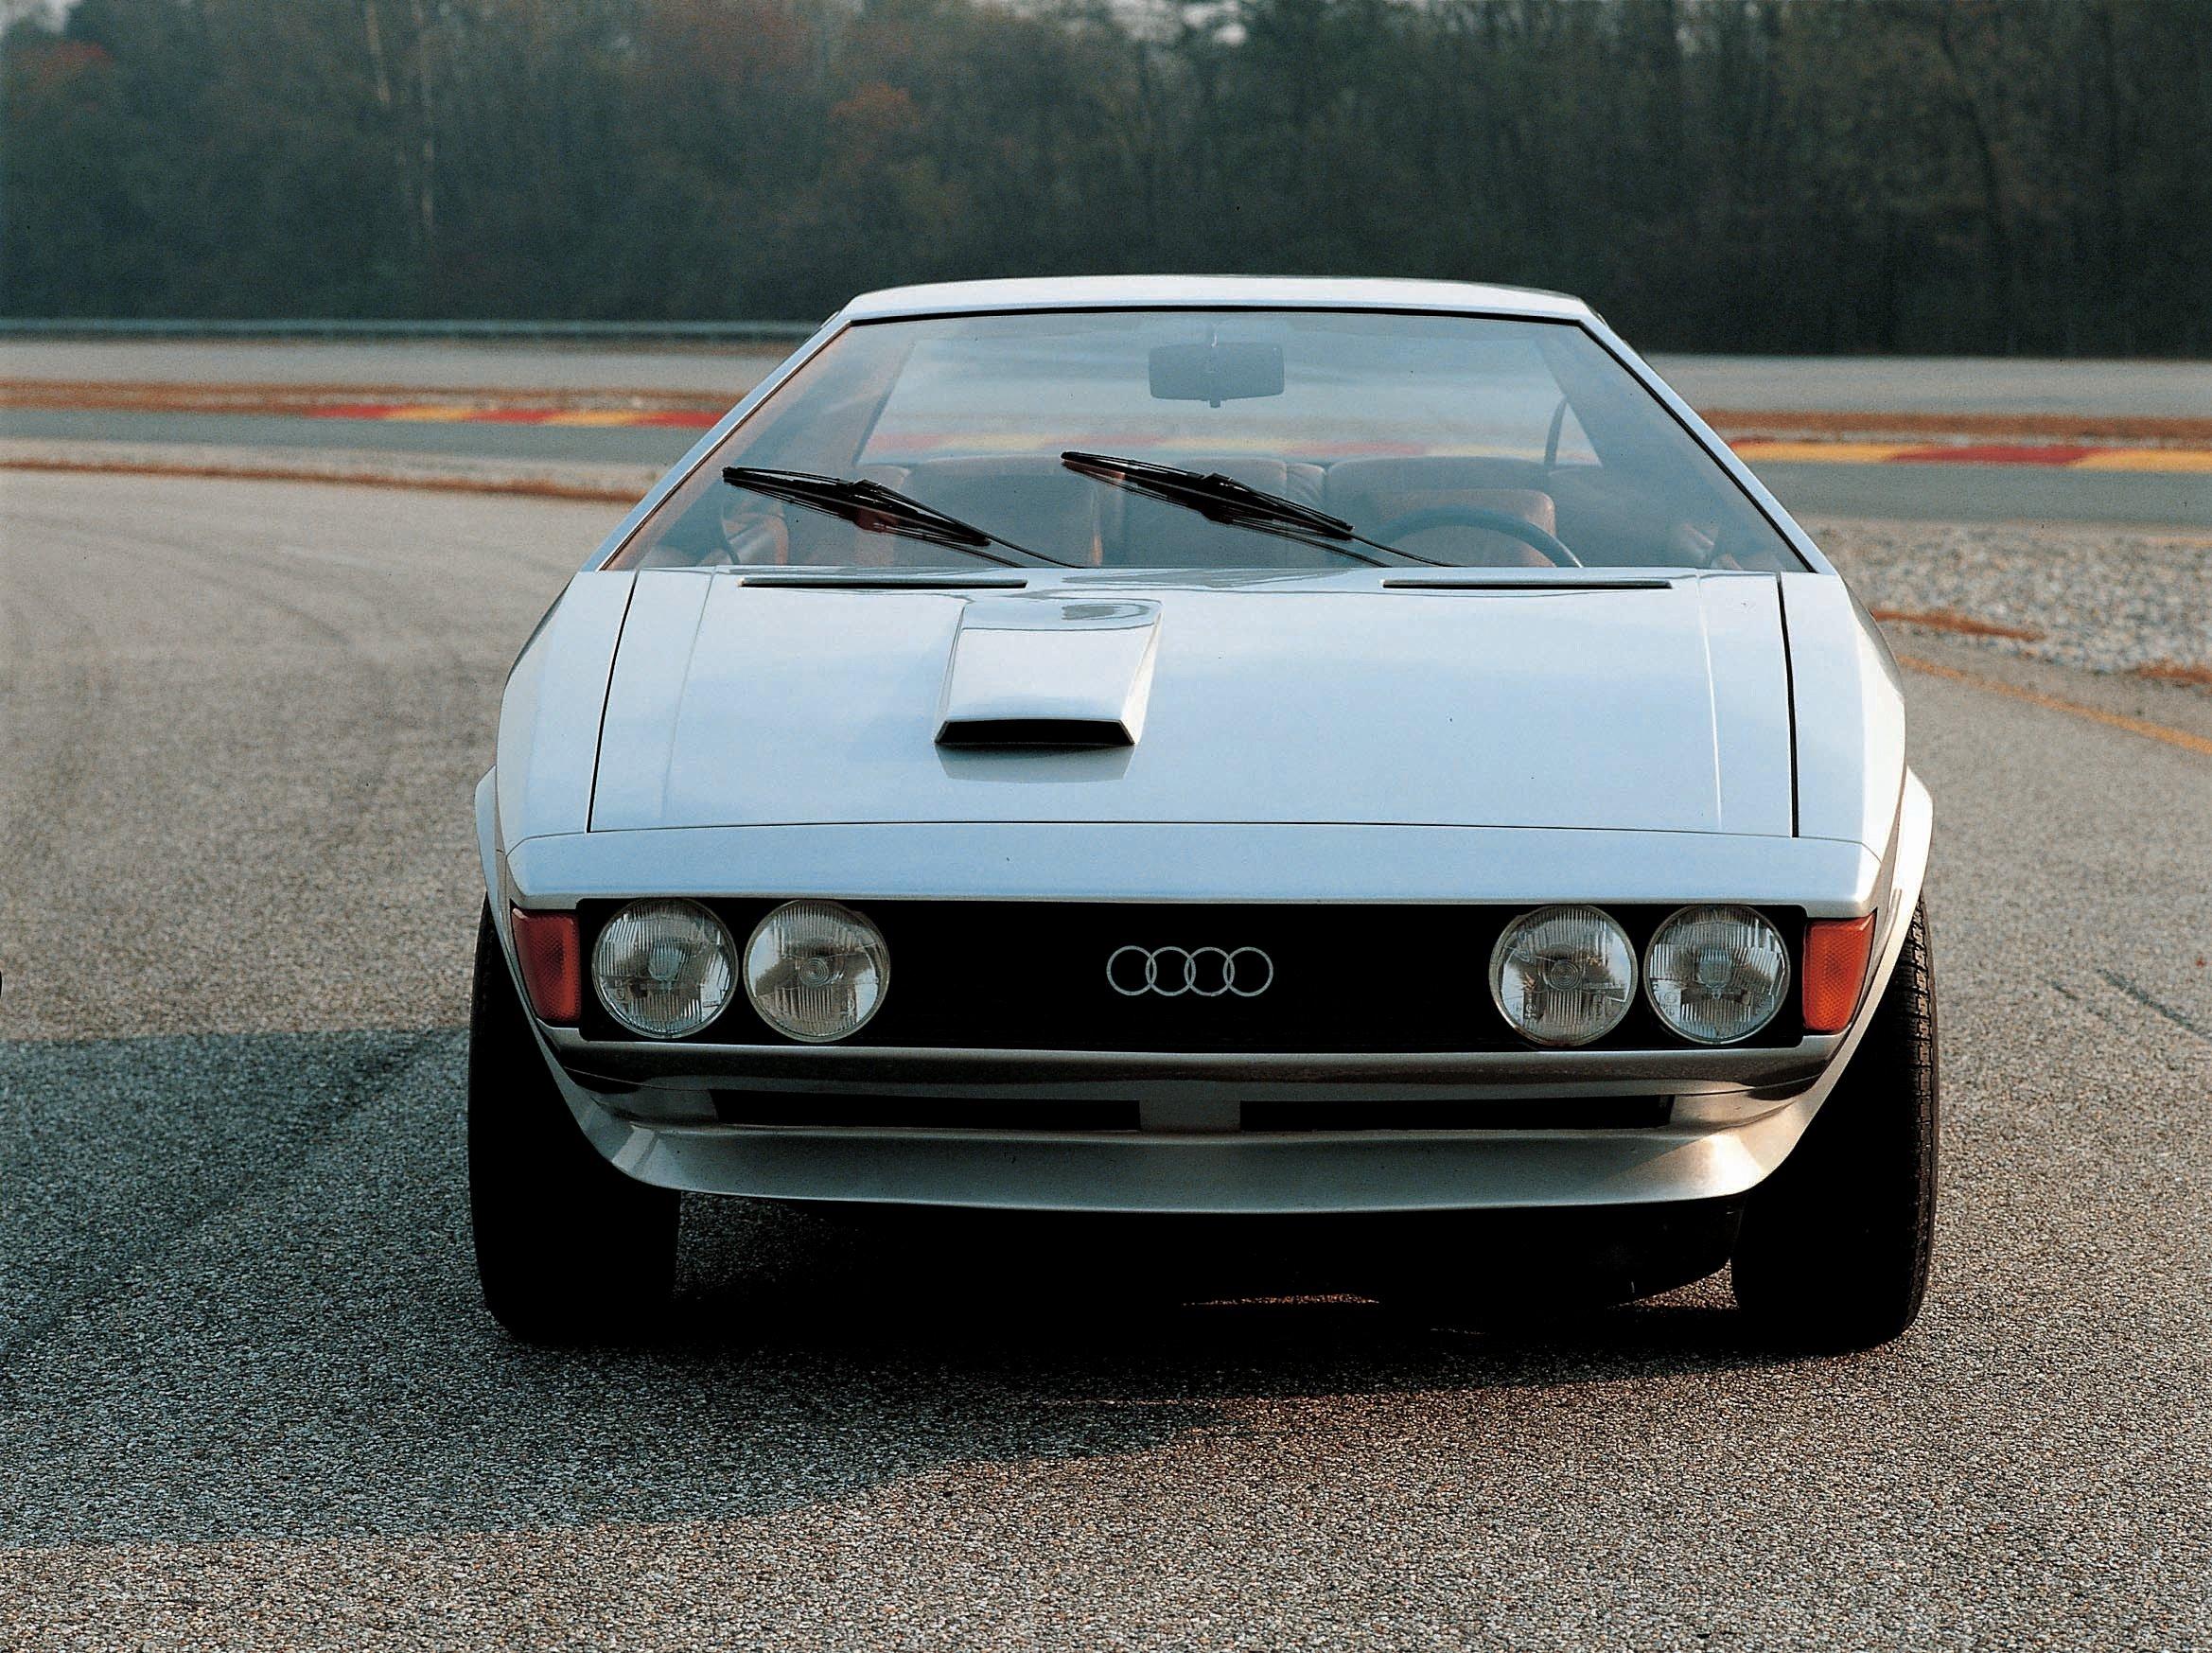 Audi_Asso_di_Picche